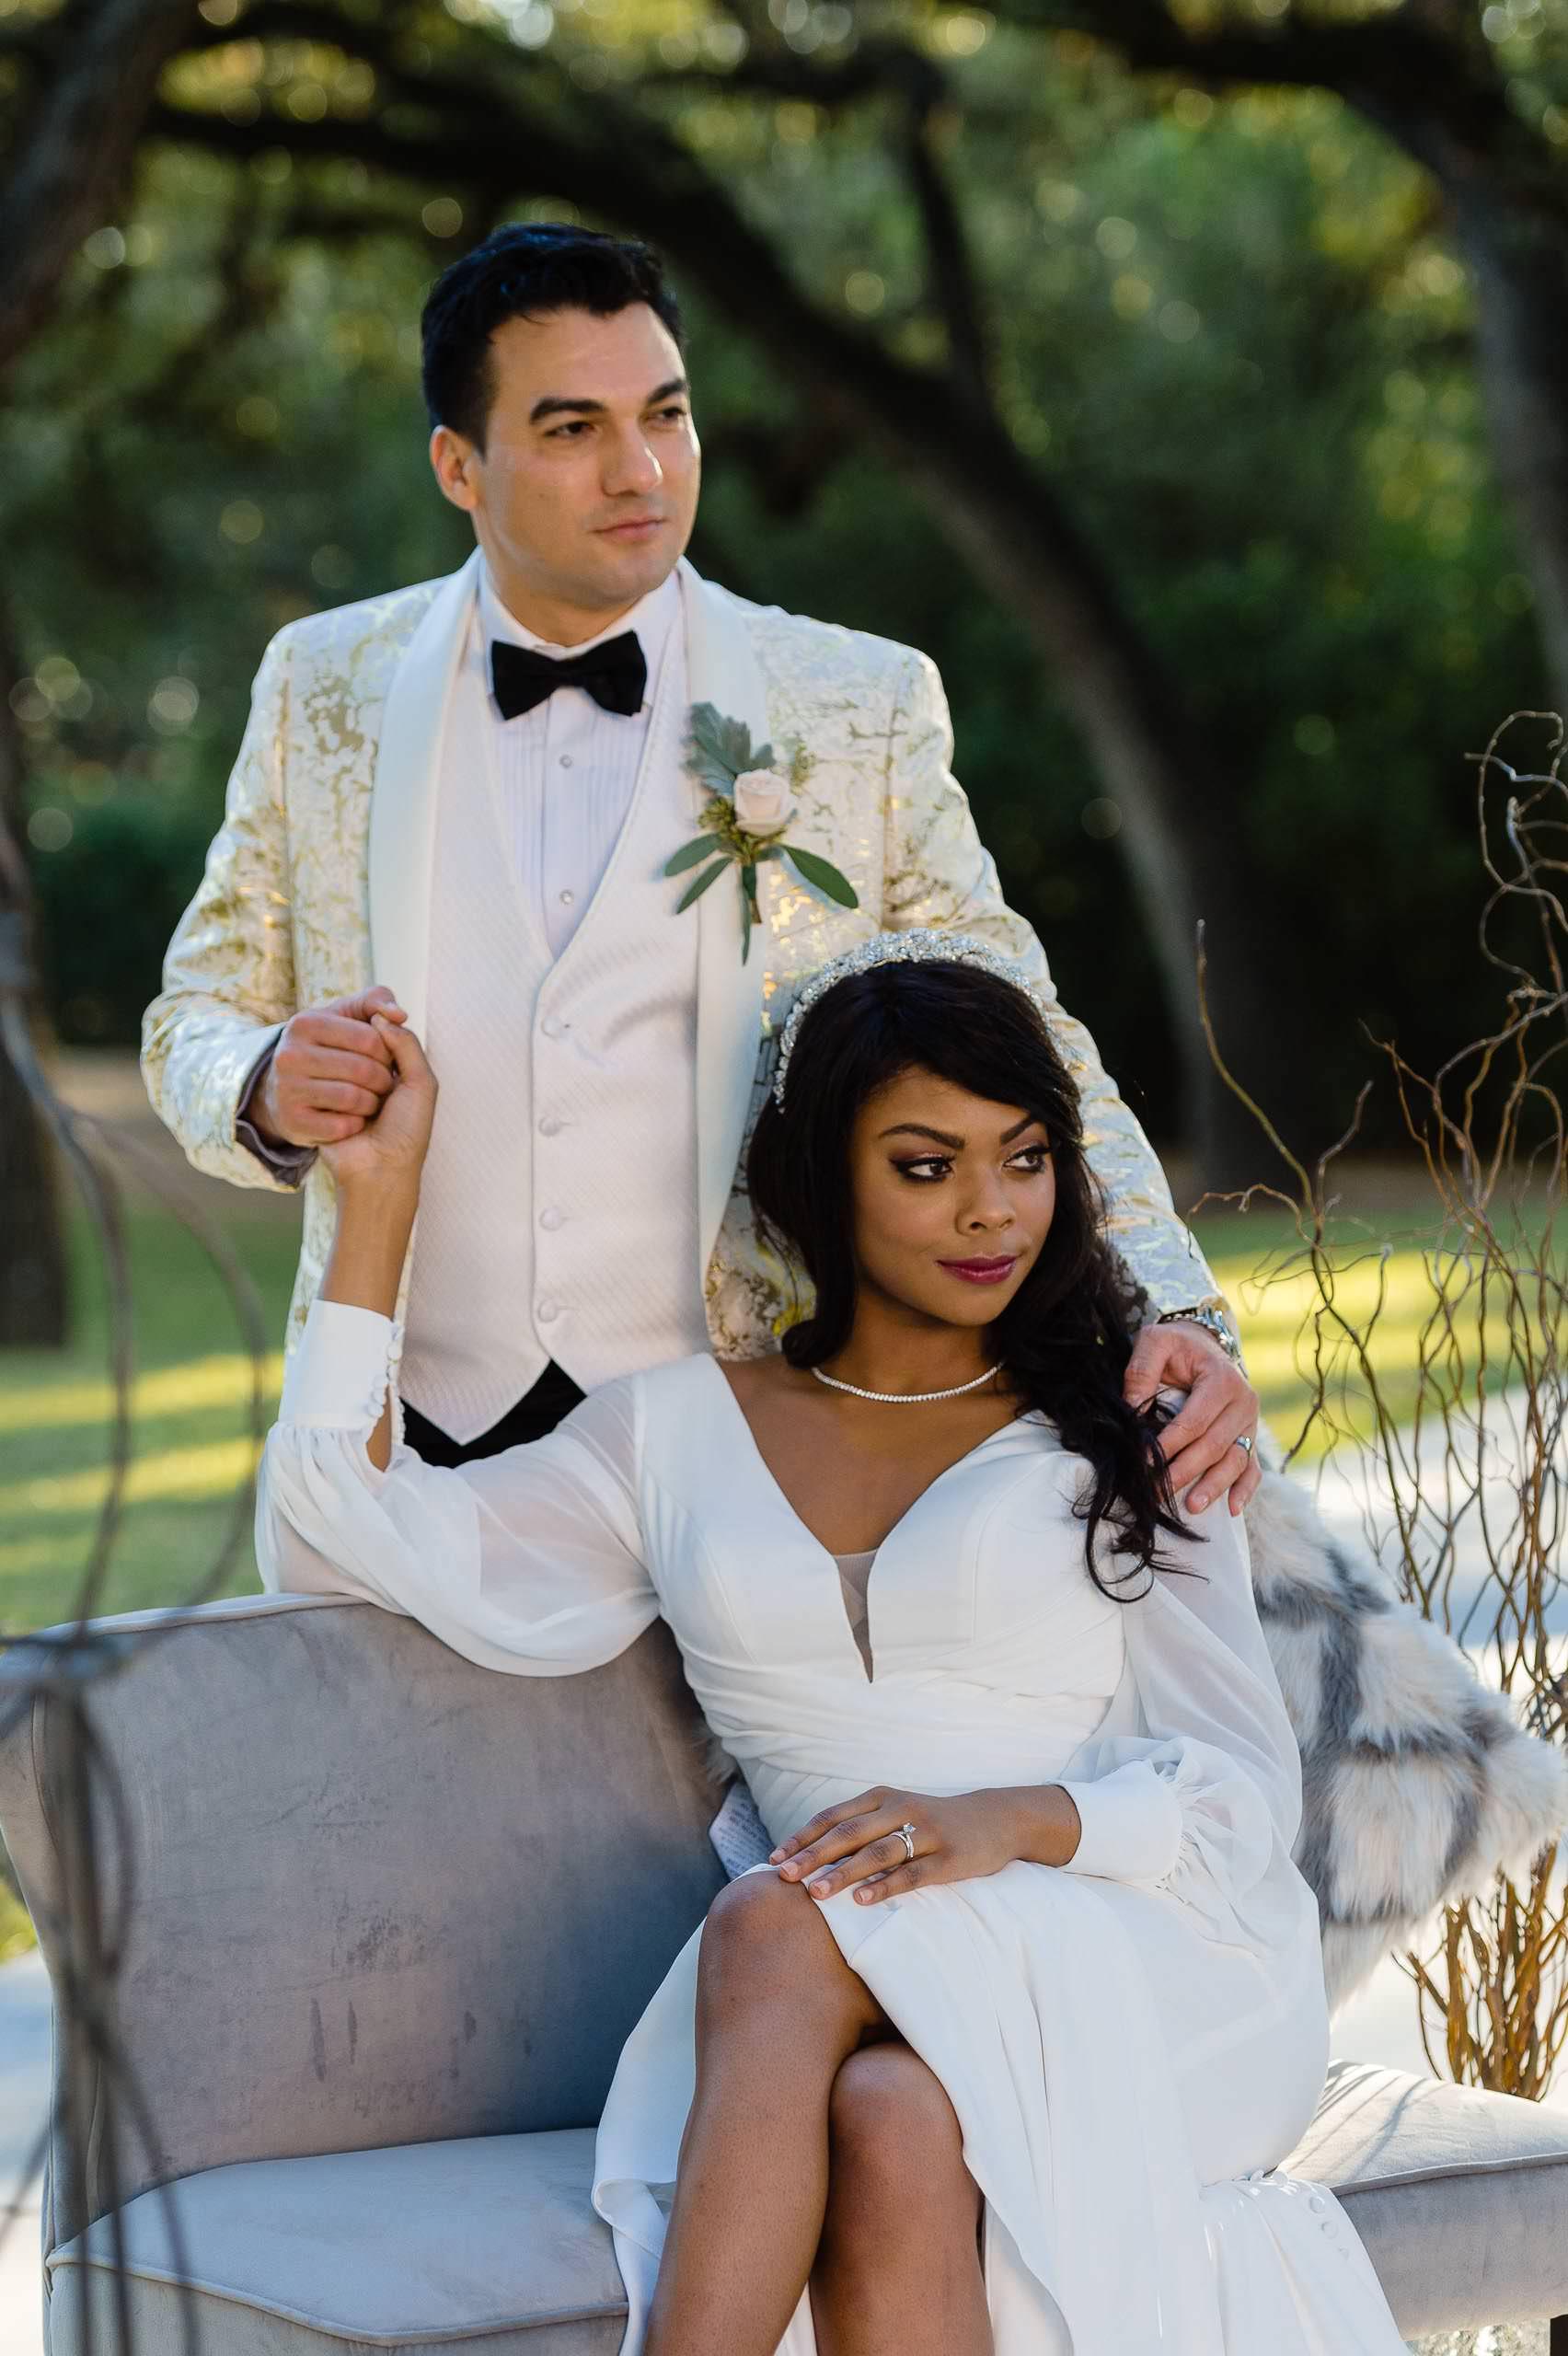 chandelier-of-gruene-winter-wedding-inspiration-_4S15675